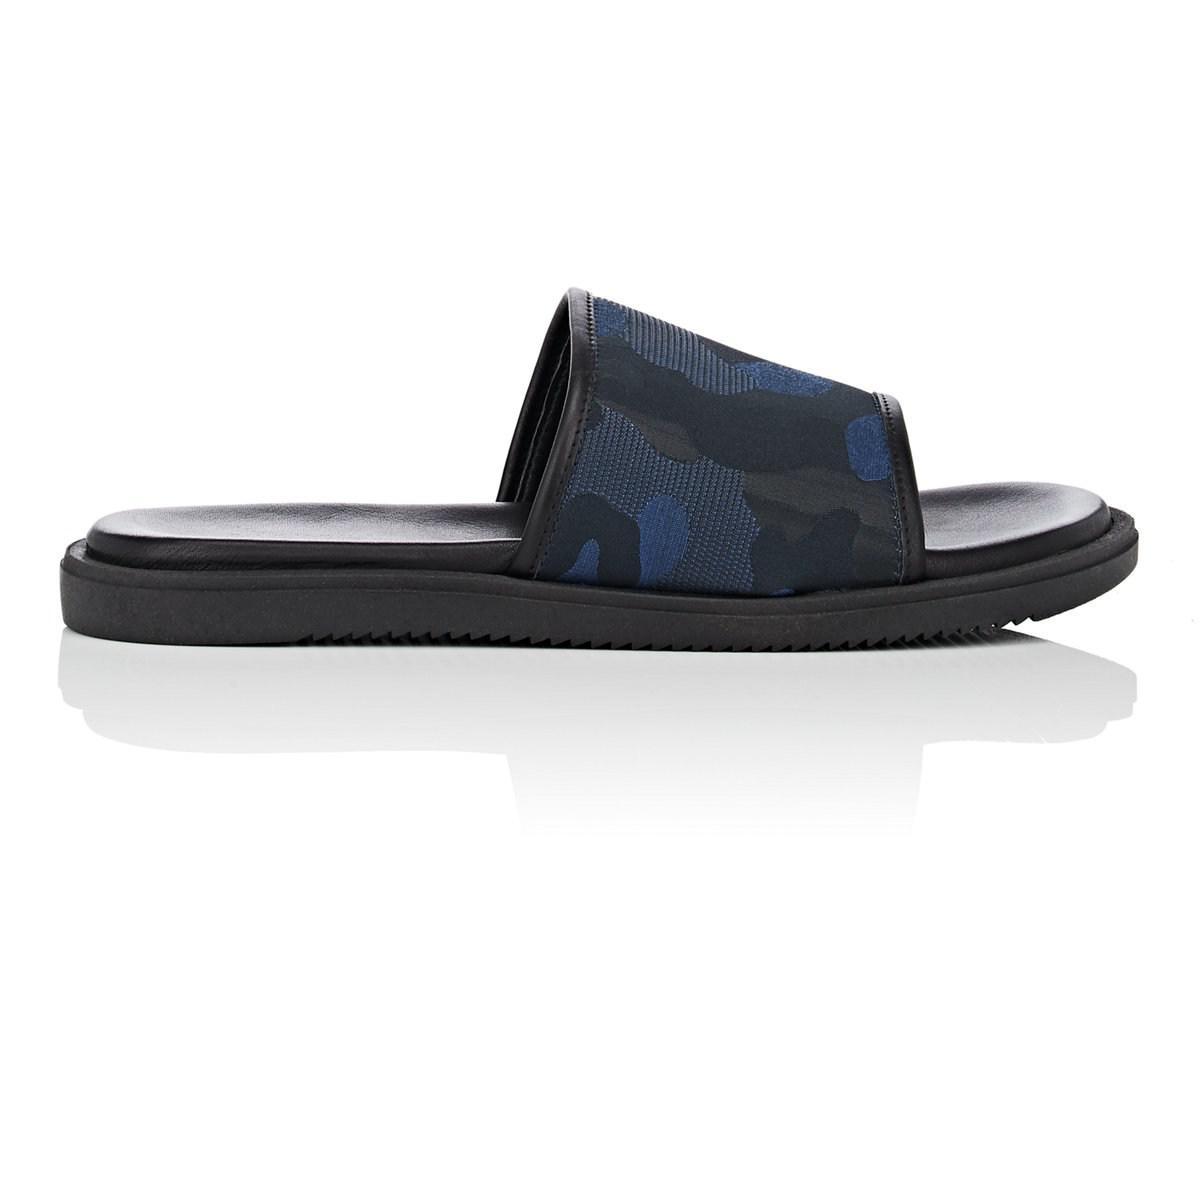 72b87a069 Lyst - Barneys New York Leather   Nylon Slide Sandals in Blue for ...